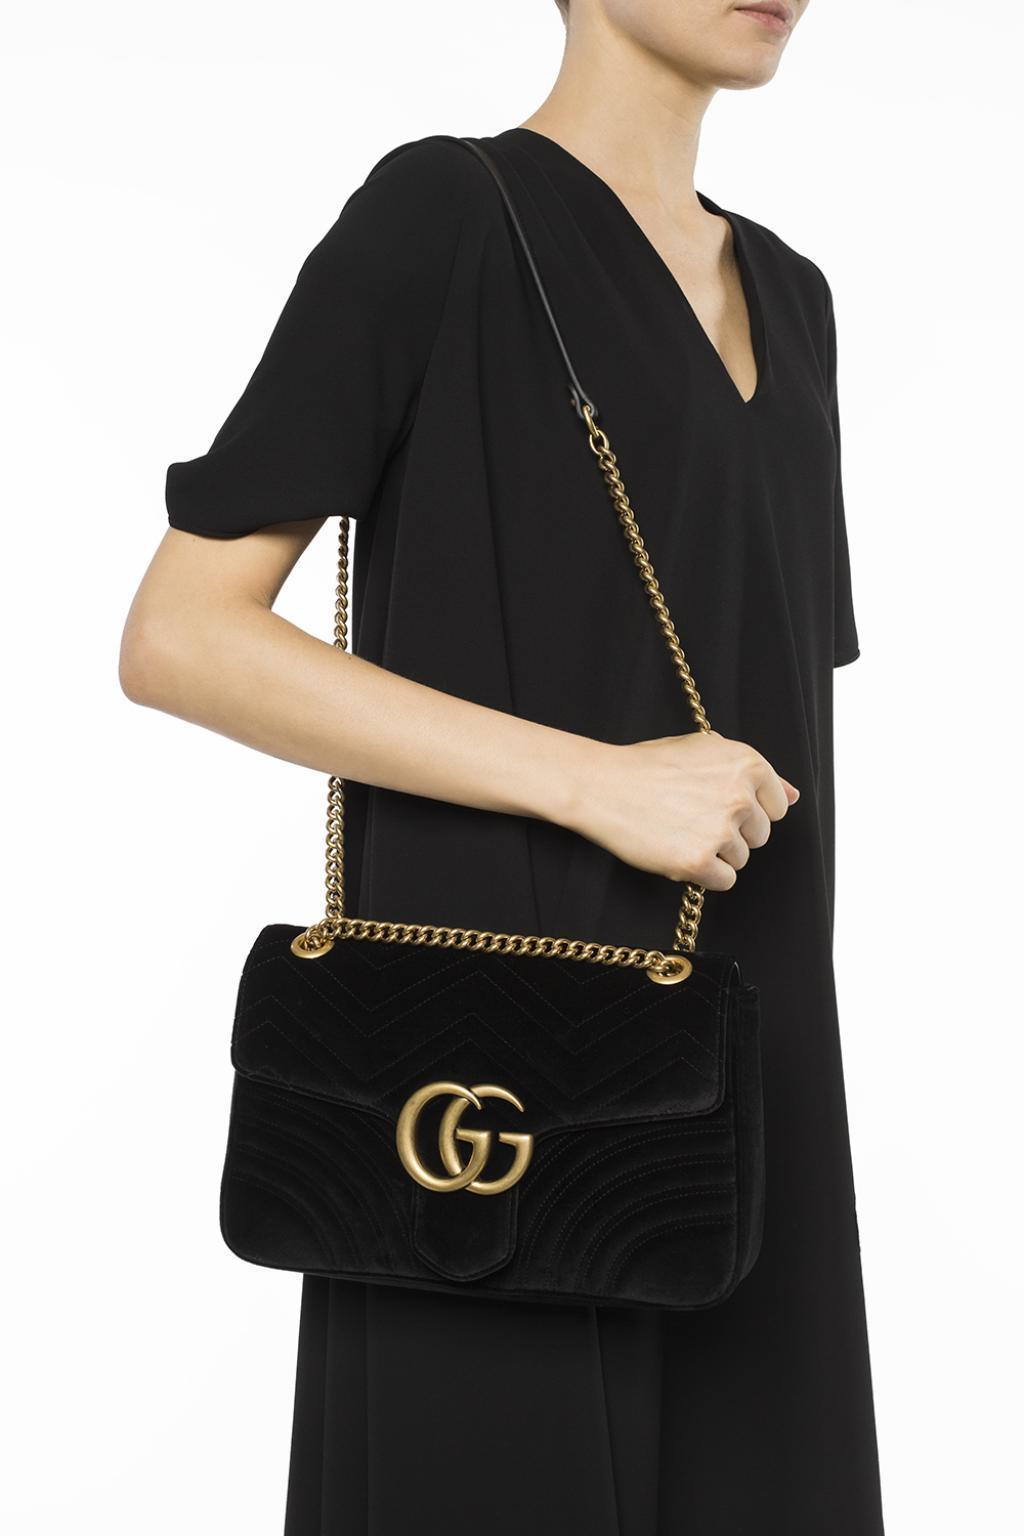 890b768791d8e5 Gucci - Black Gg 2.0 Medium Quilted Velvet Shoulder Bag - Lyst. View  fullscreen